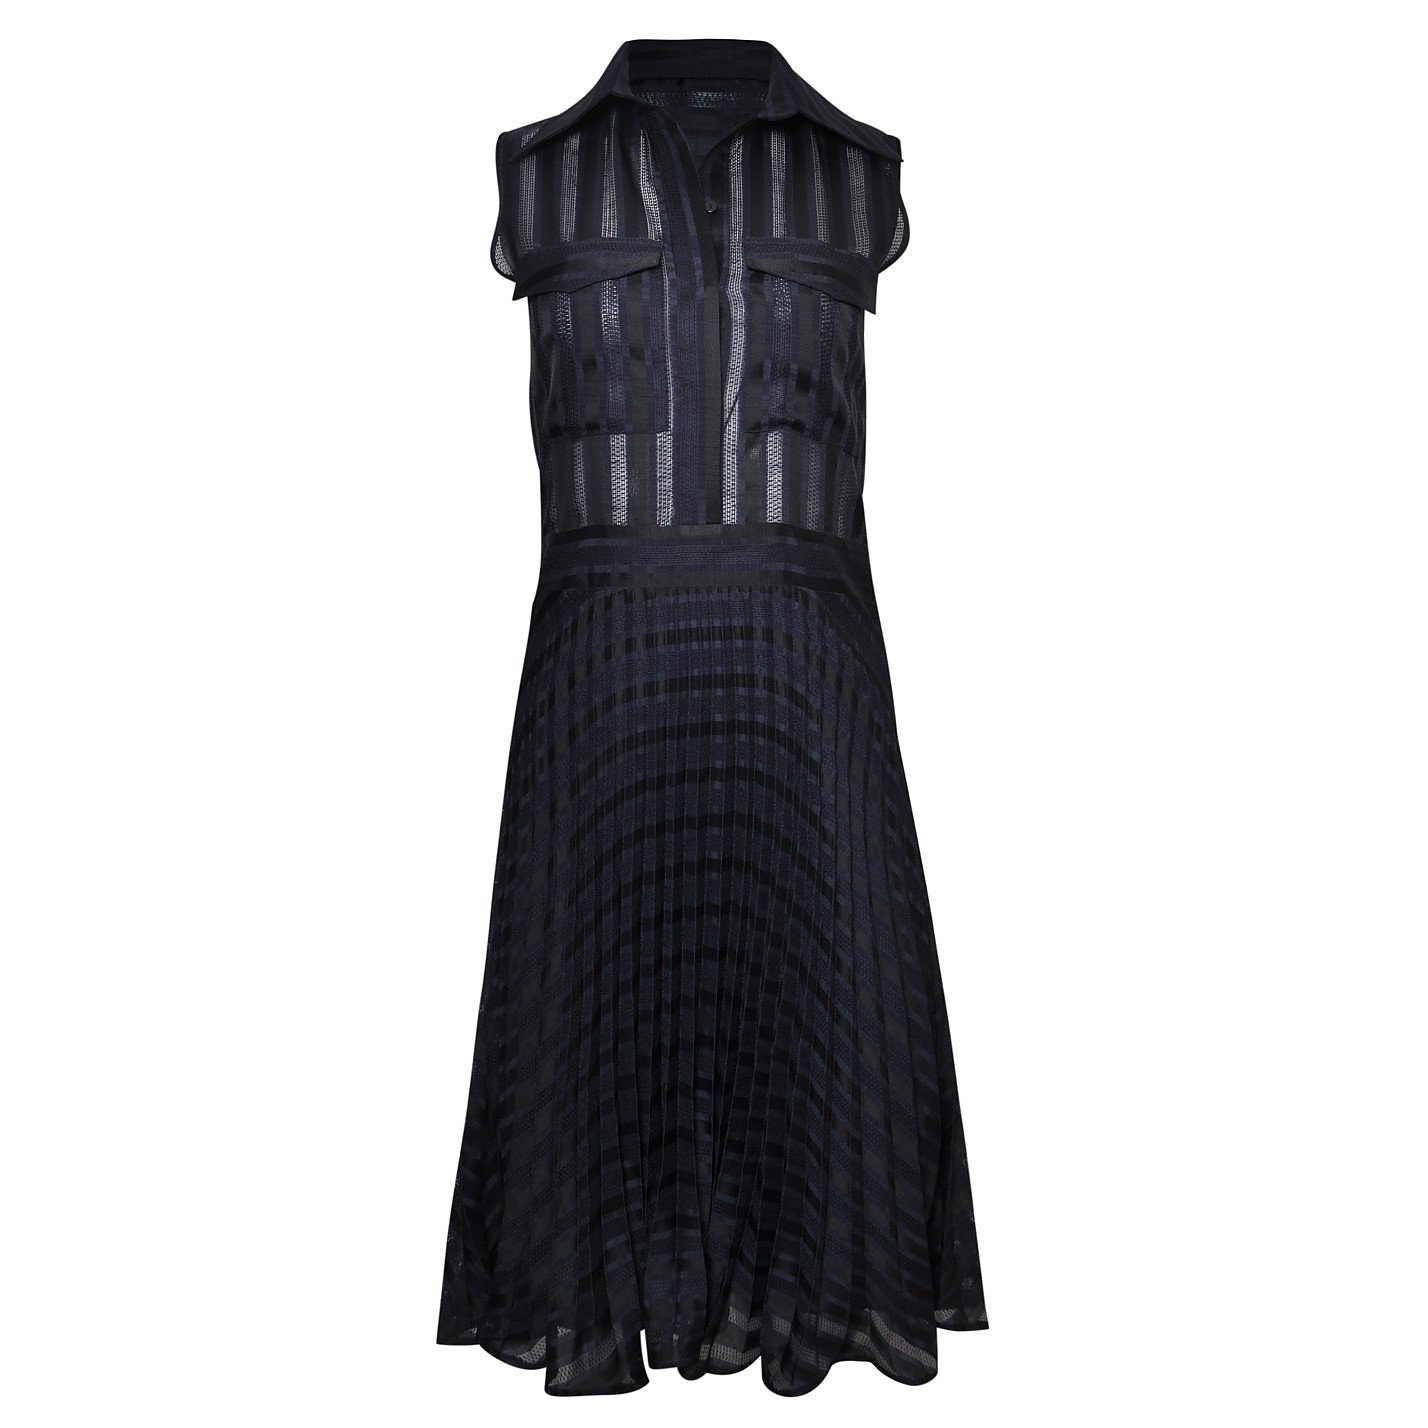 Victoria Beckham Pleated Midi Shirt Dress